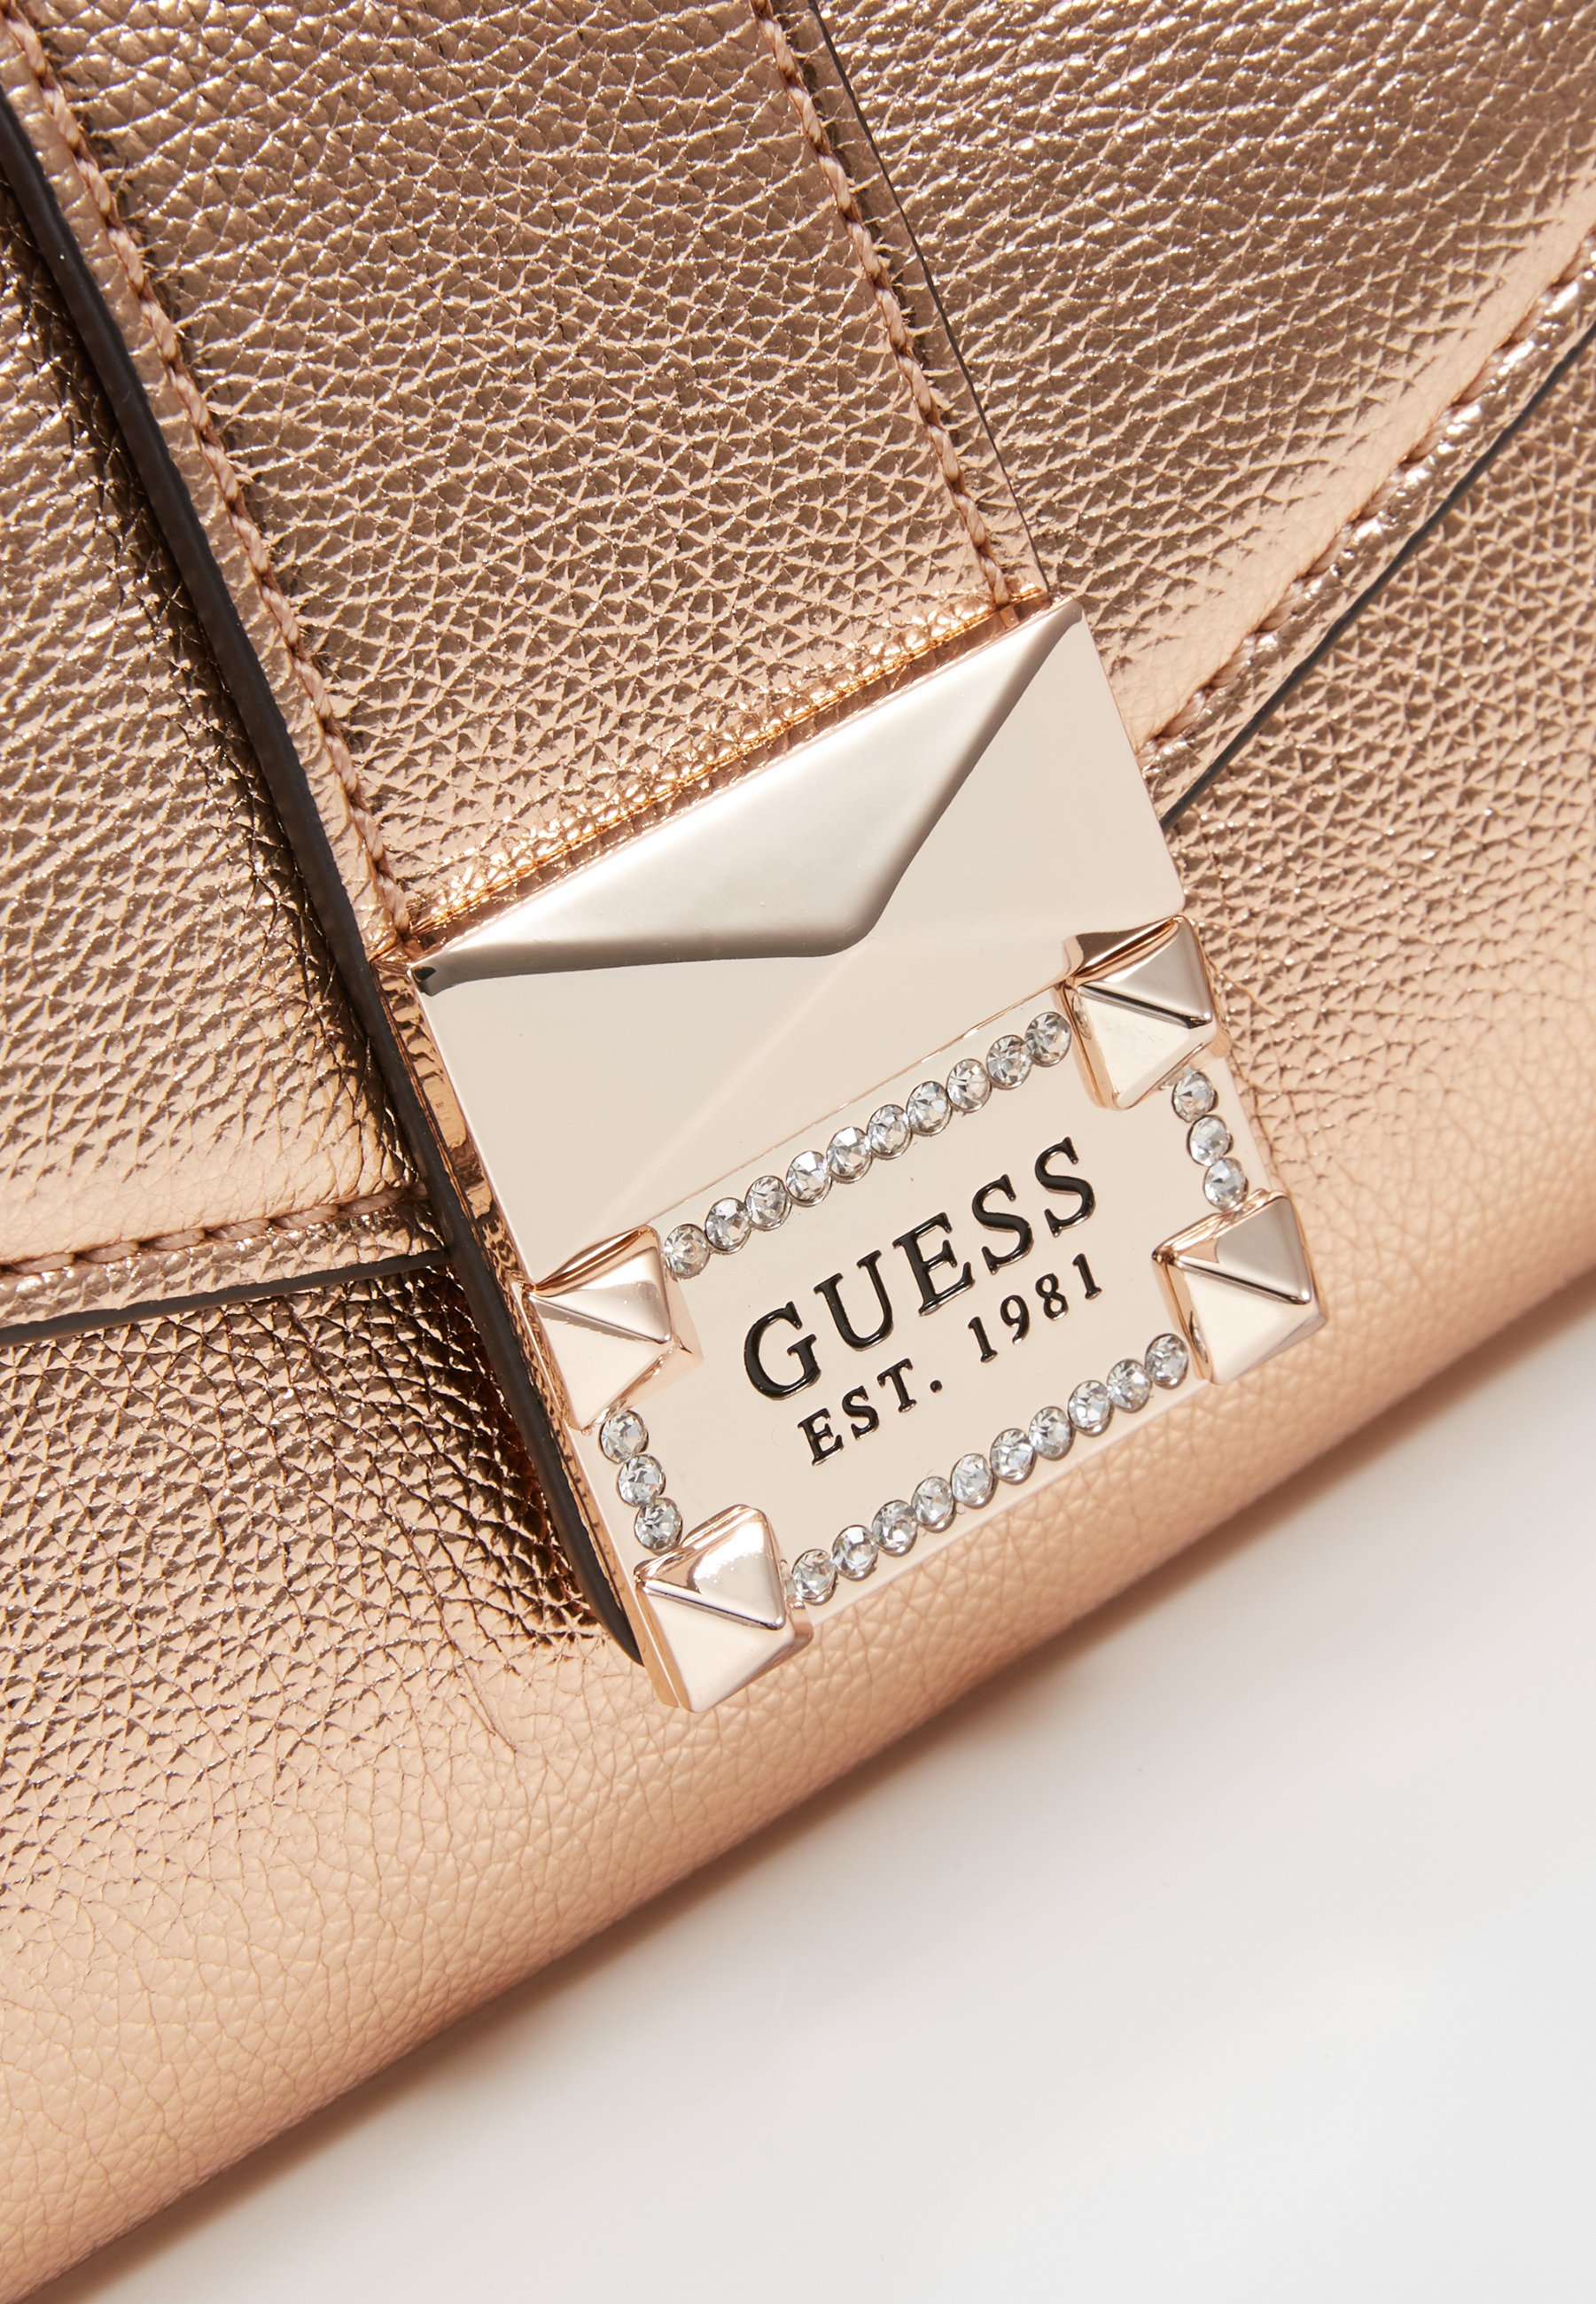 Guess Dazzle Clutch - Pochette Rose Gold RBlIR